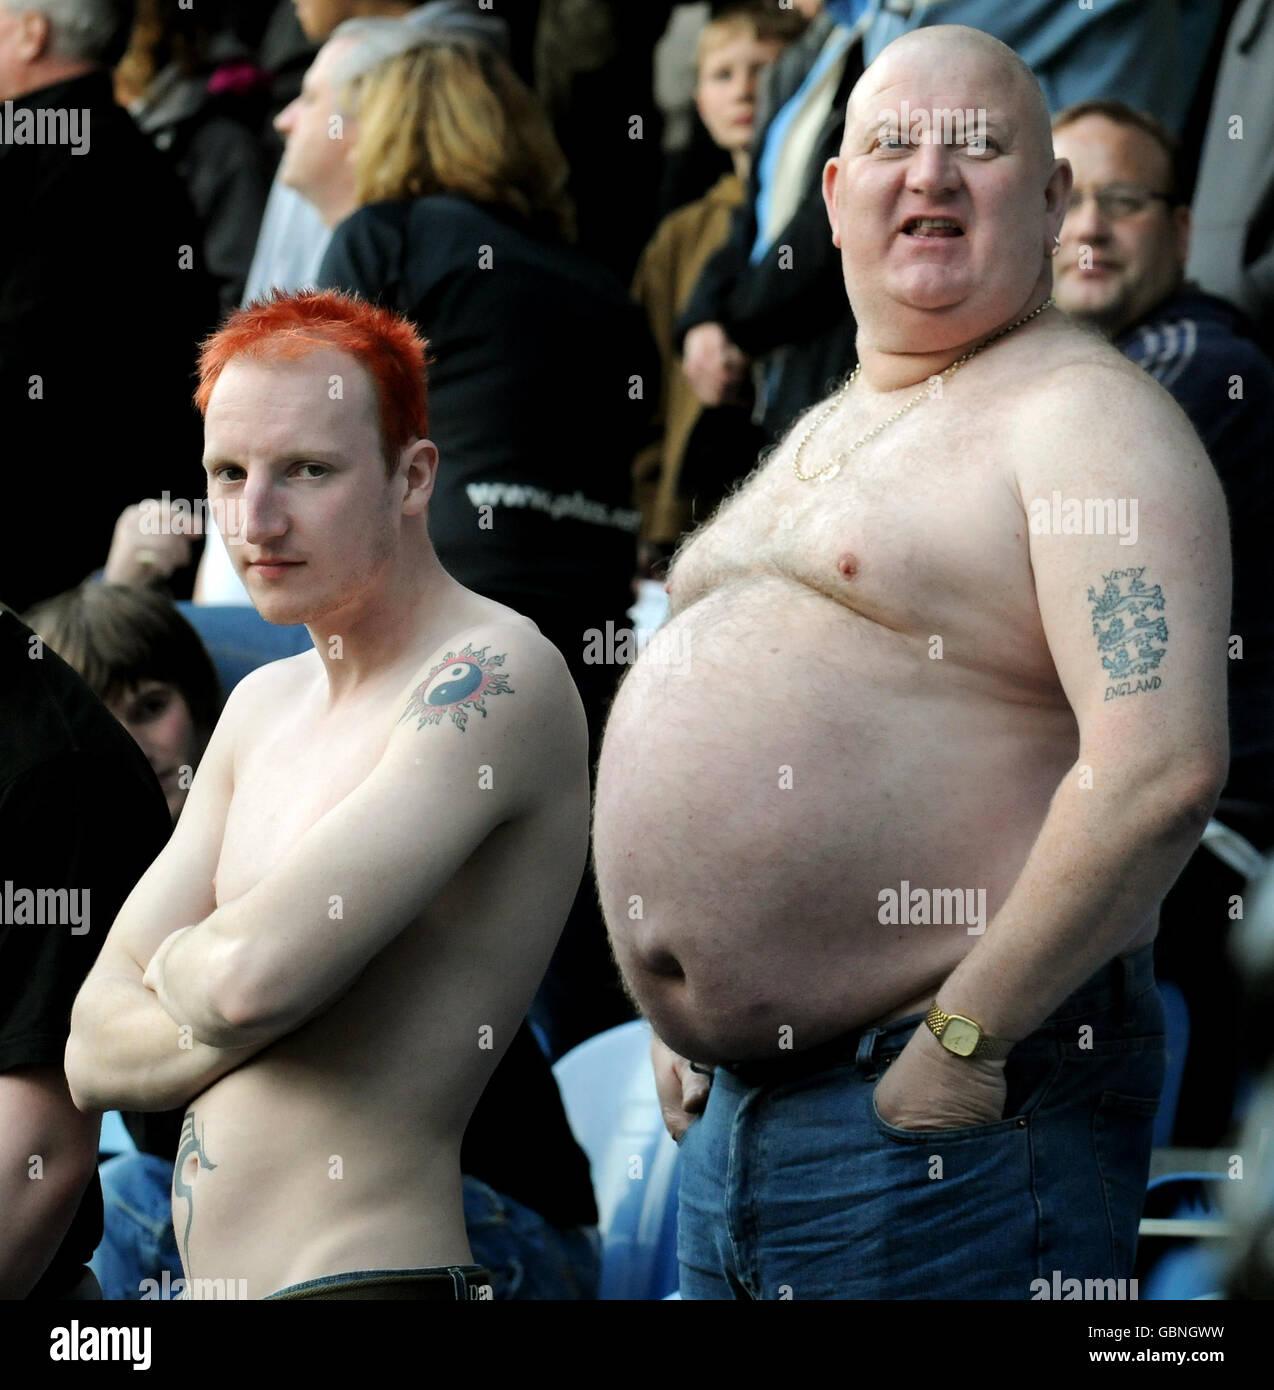 soccer-coca-cola-football-championship-queens-park-rangers-v-sheffield-GBNGWW.jpg